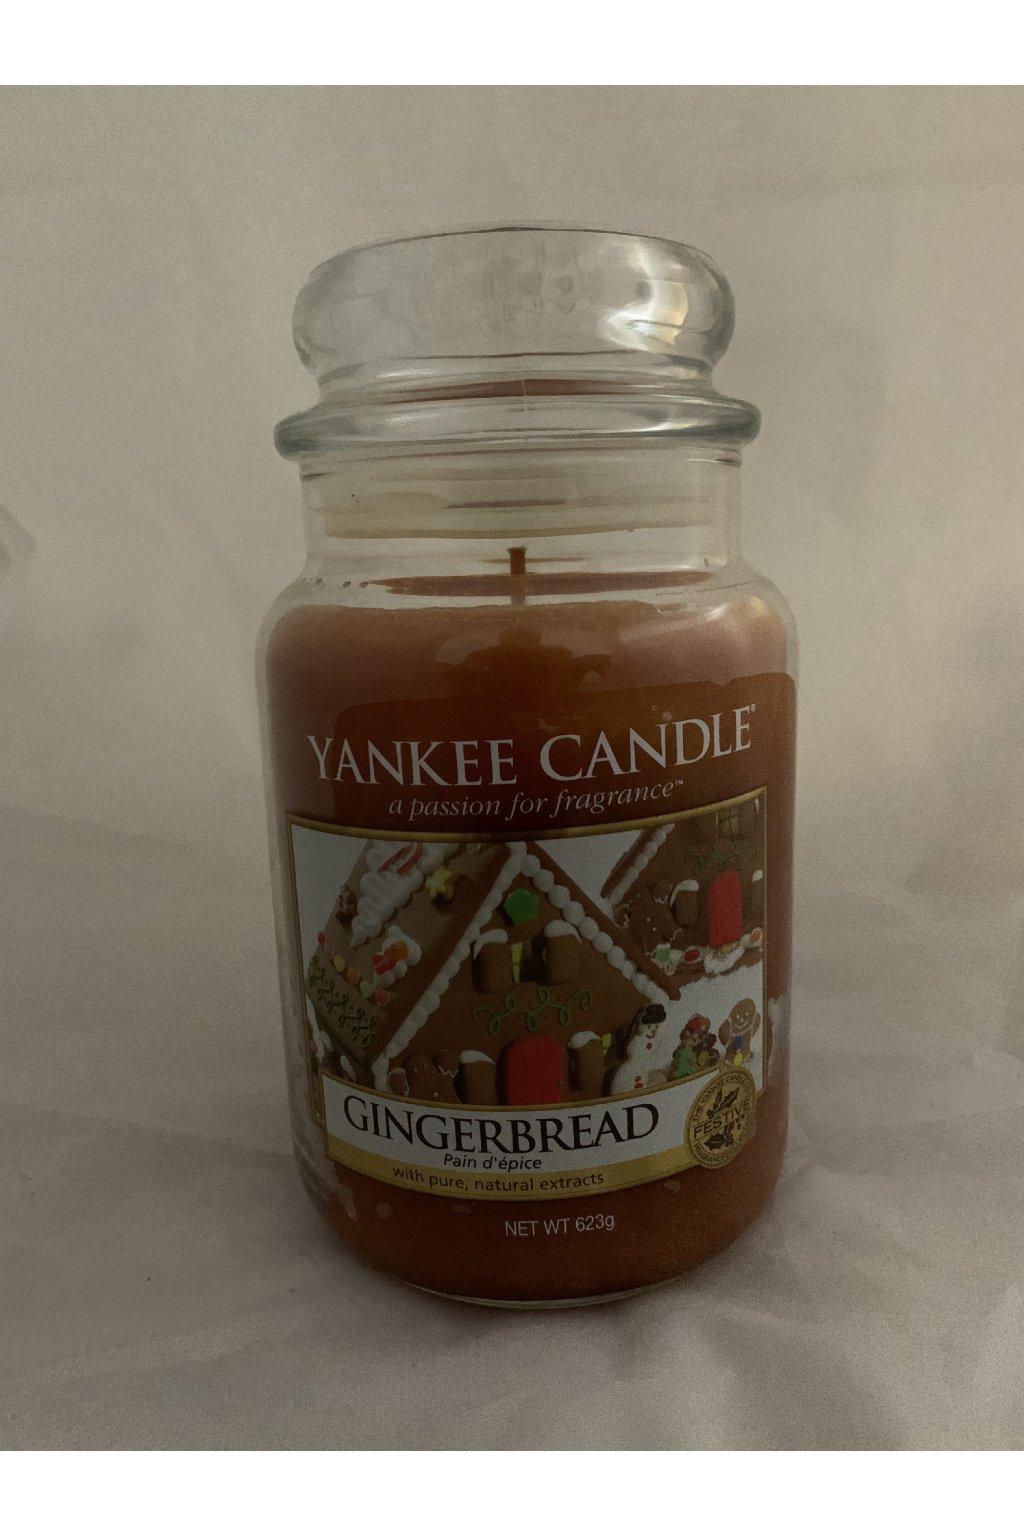 Yankee Candle Gingerbread 623g 2015  USA